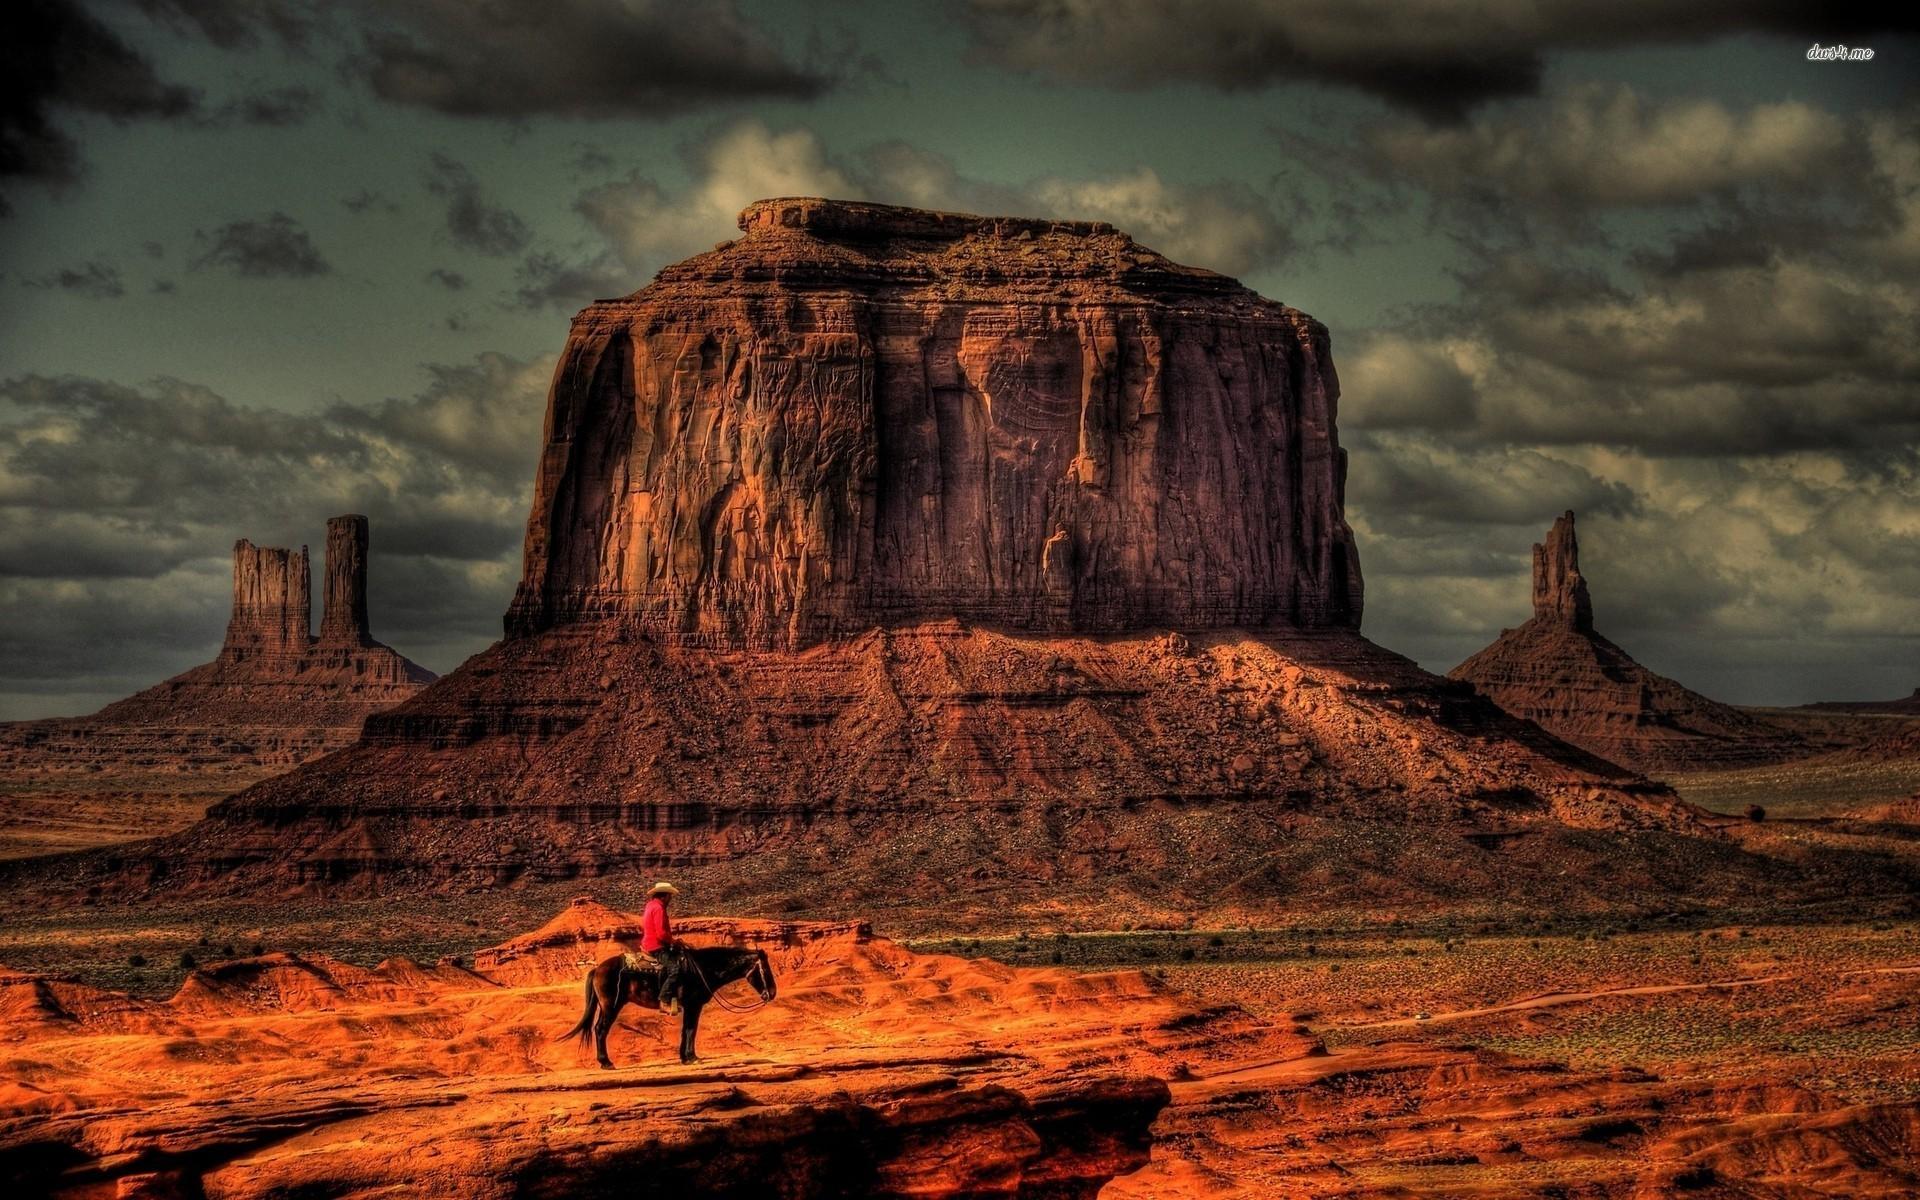 Western Cowboy Desktop Wallpaper – WallpaperSafari